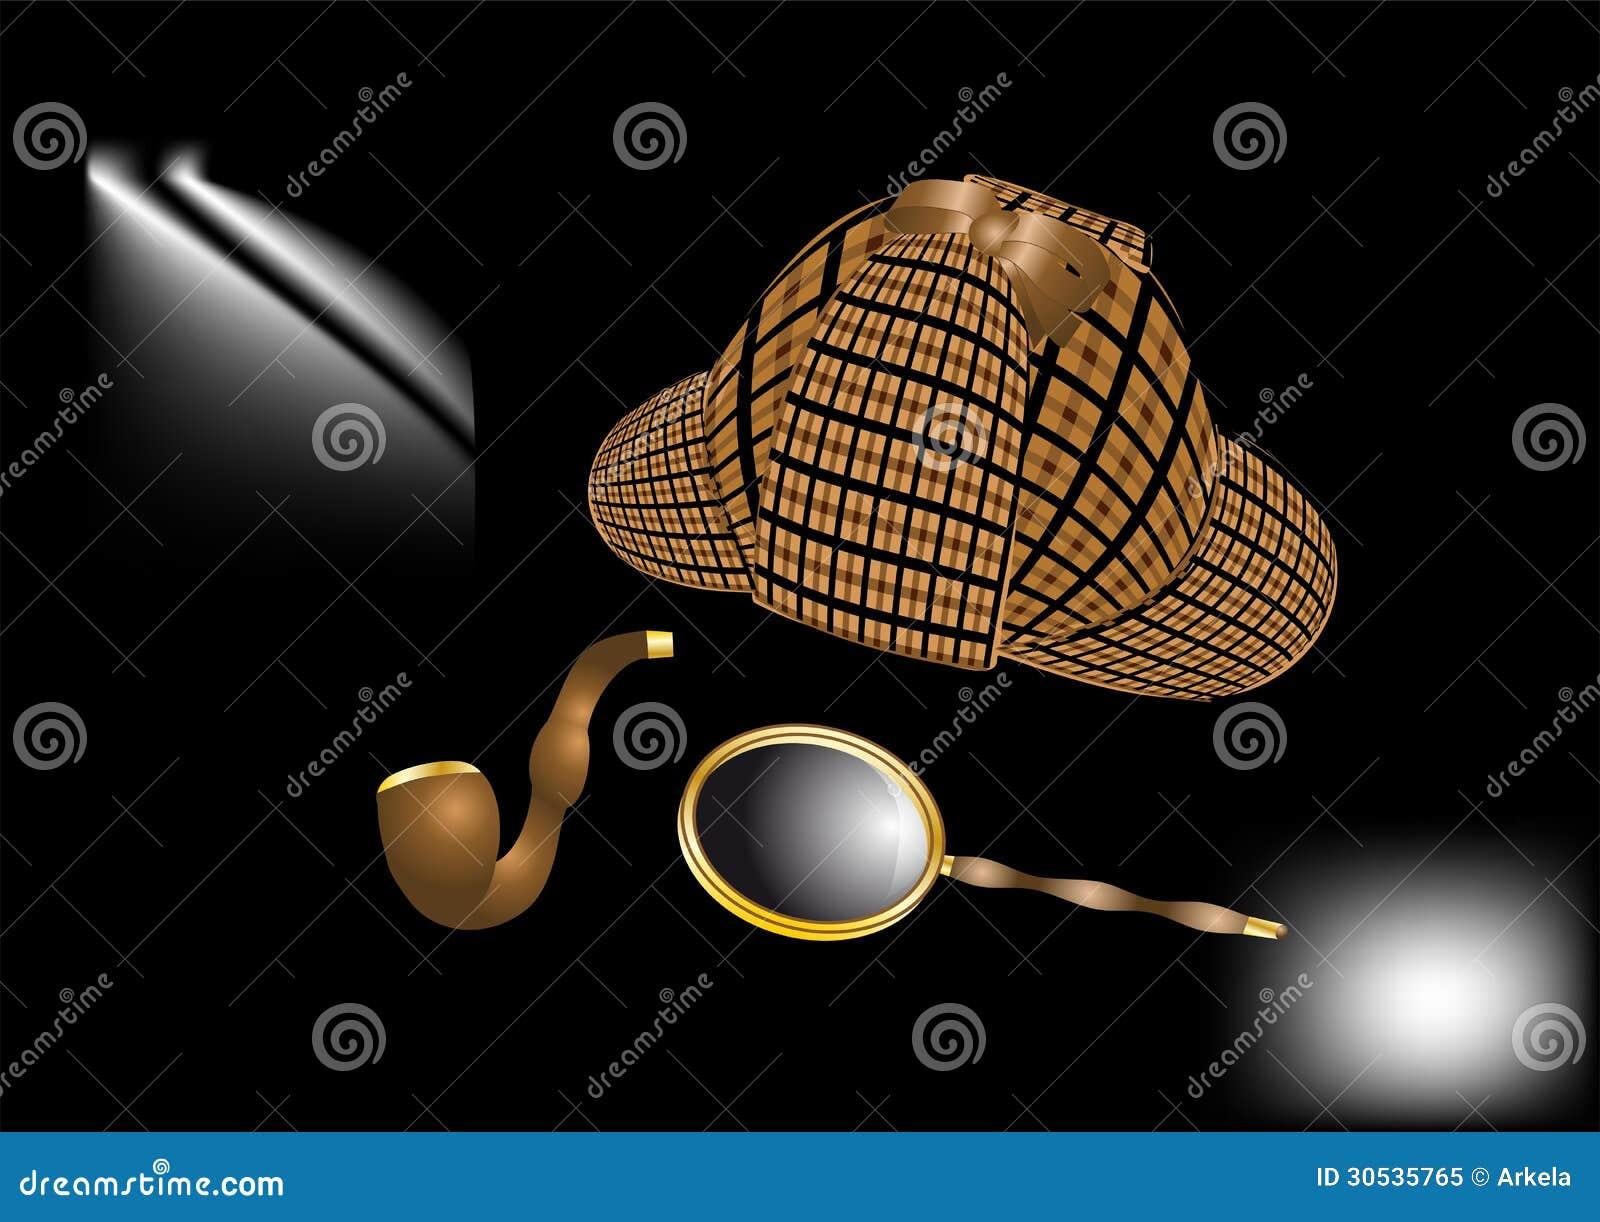 Sherlock Holmes Kit Royalty Free Stock Photo - Image: 30535765